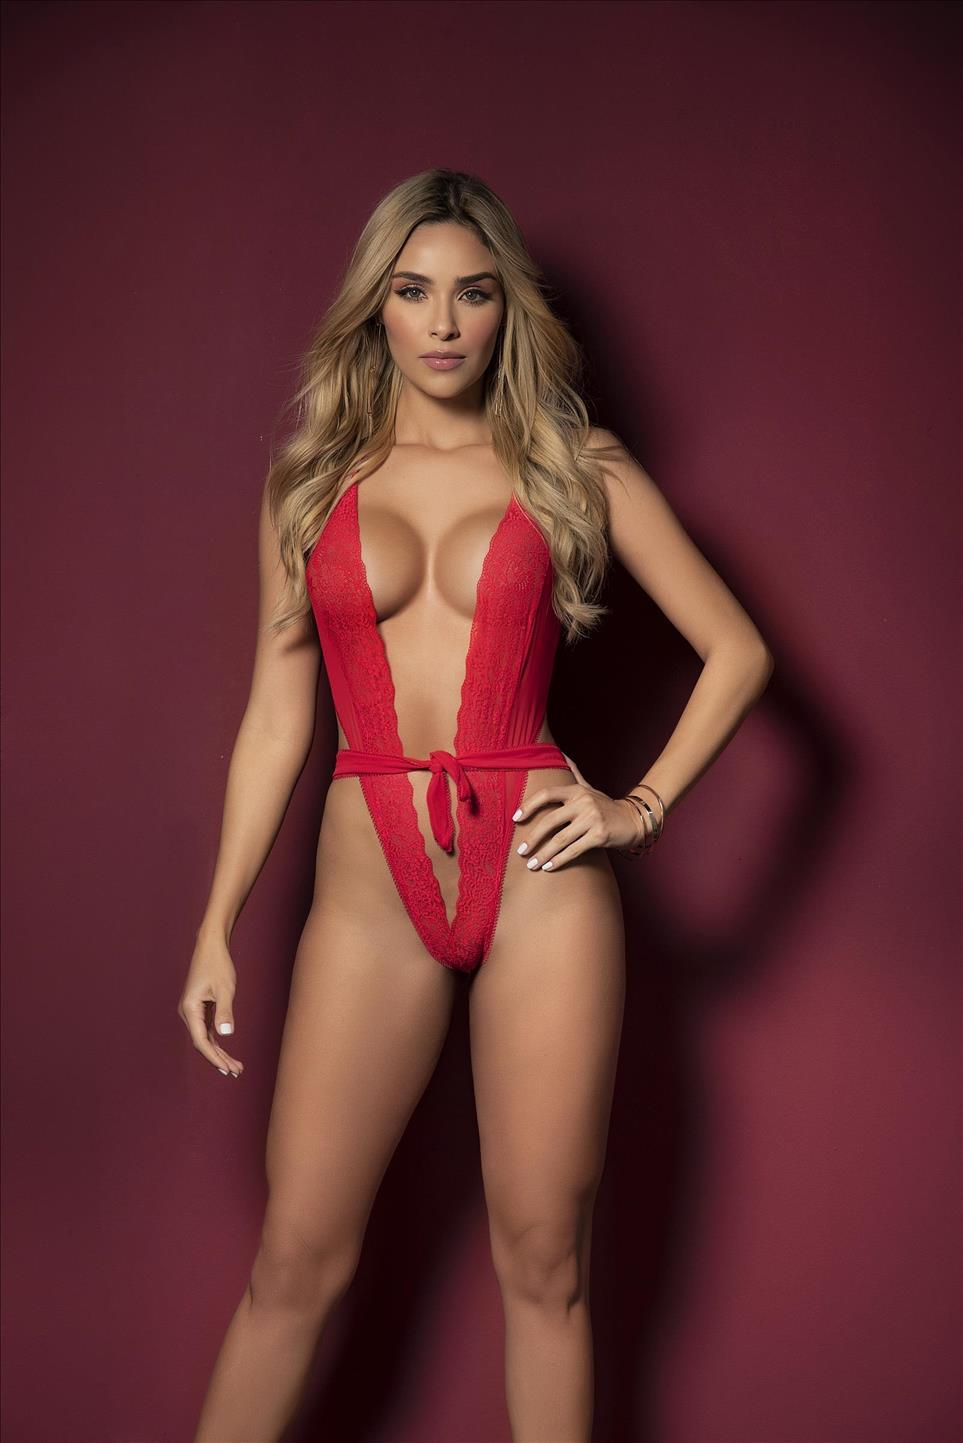 cool women wearing sexy lingerie